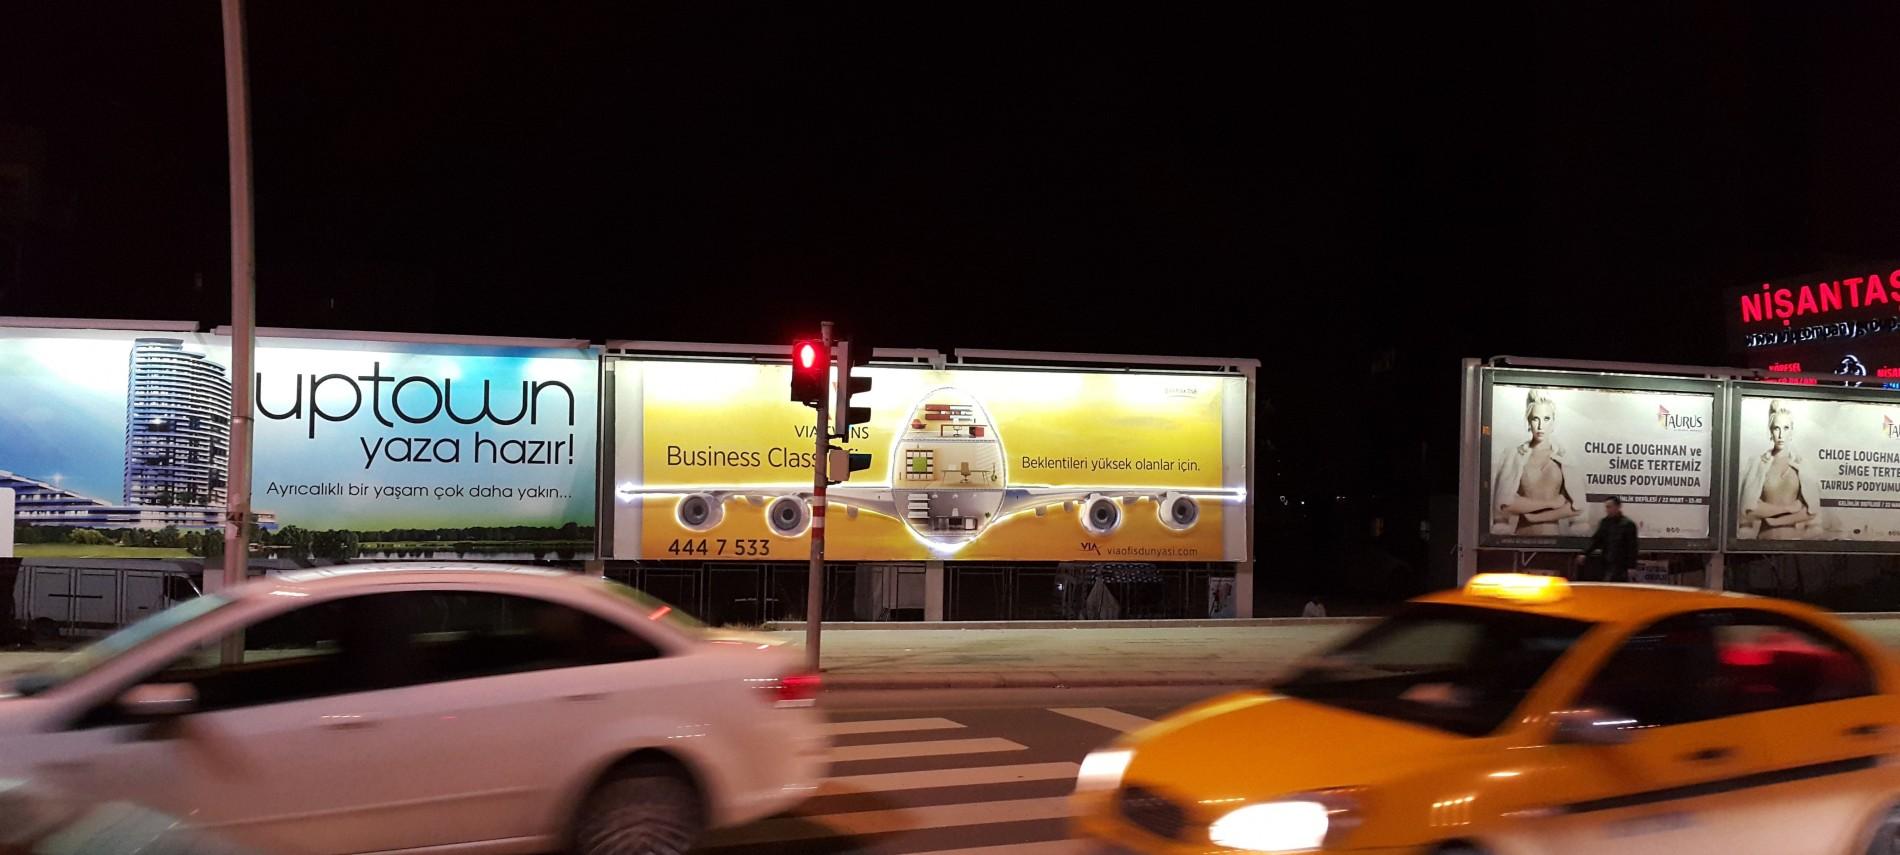 motto-reklam